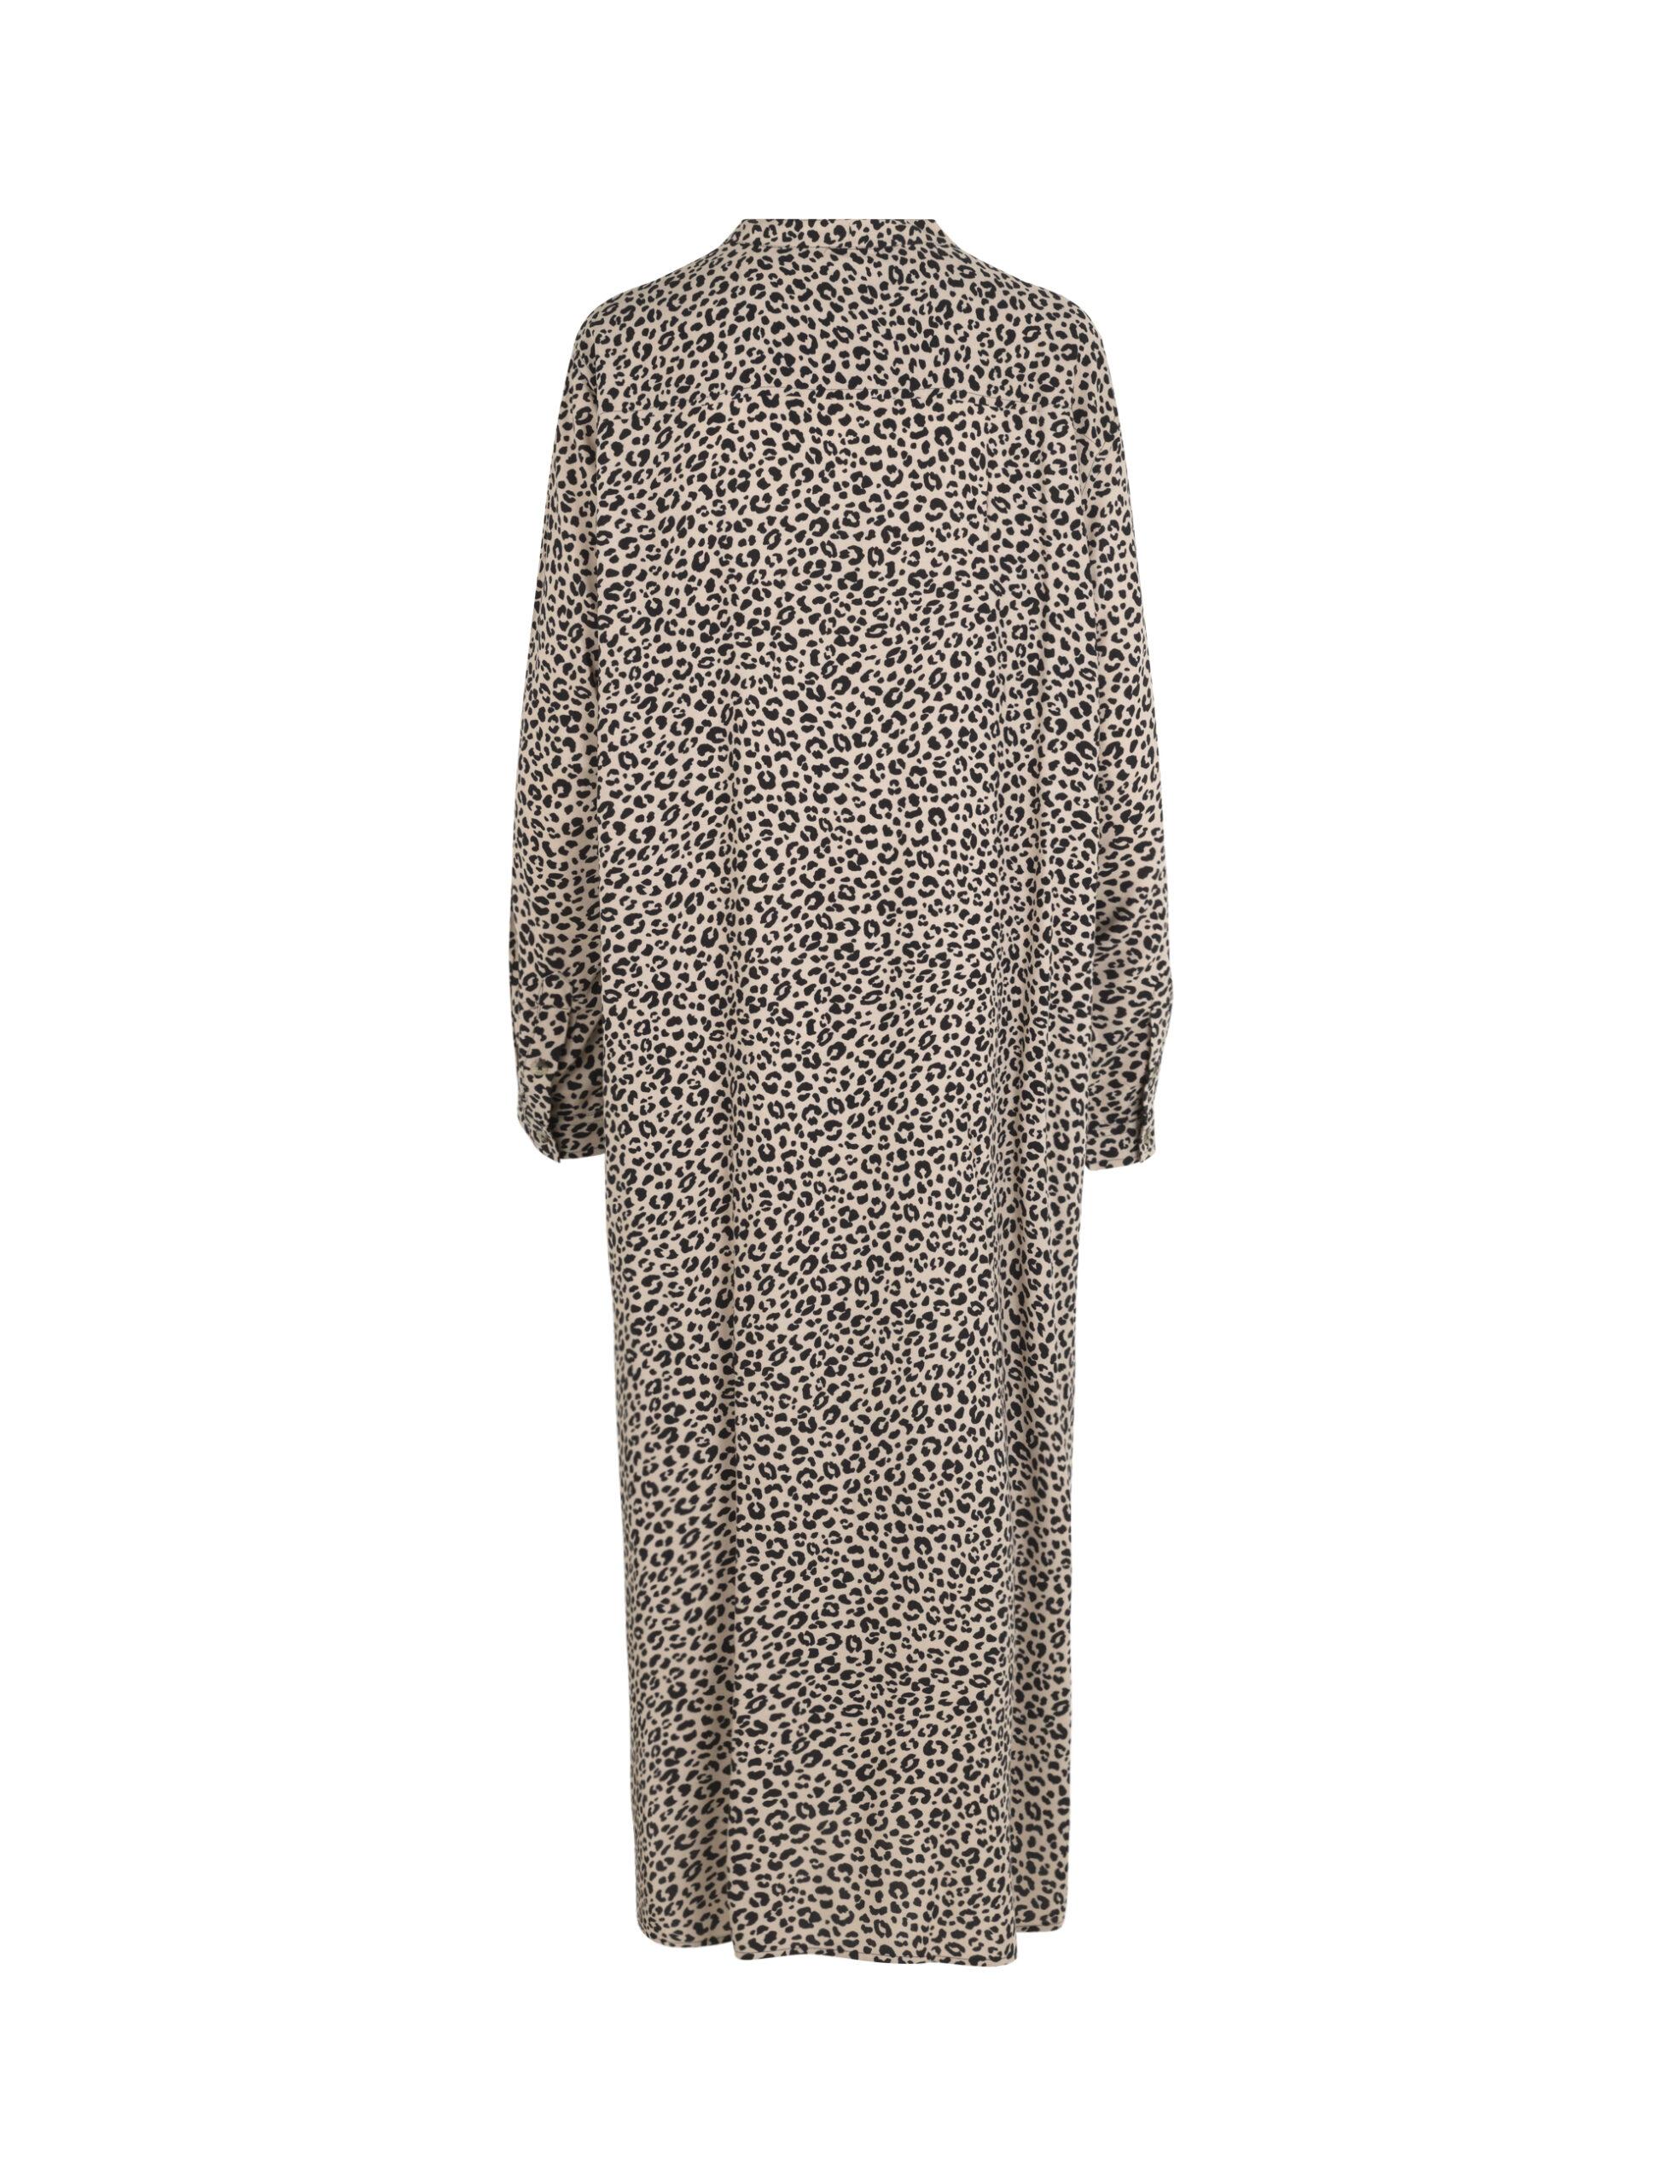 Pureheart long – Gepard